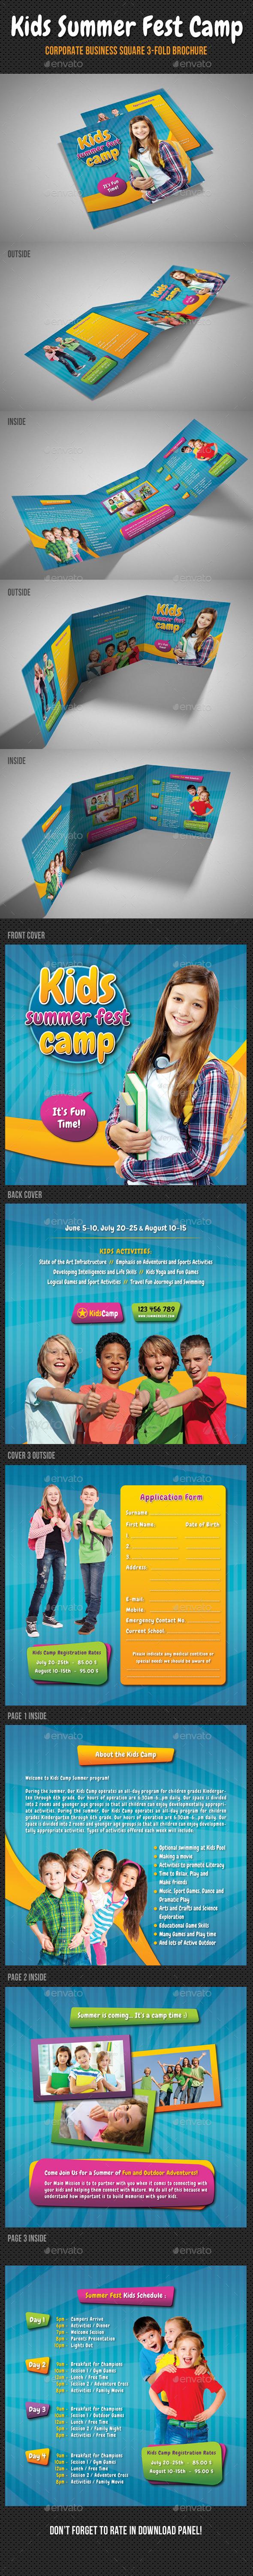 GraphicRiver Kids Summer Camp Square 3-Fold Brochure 11268725